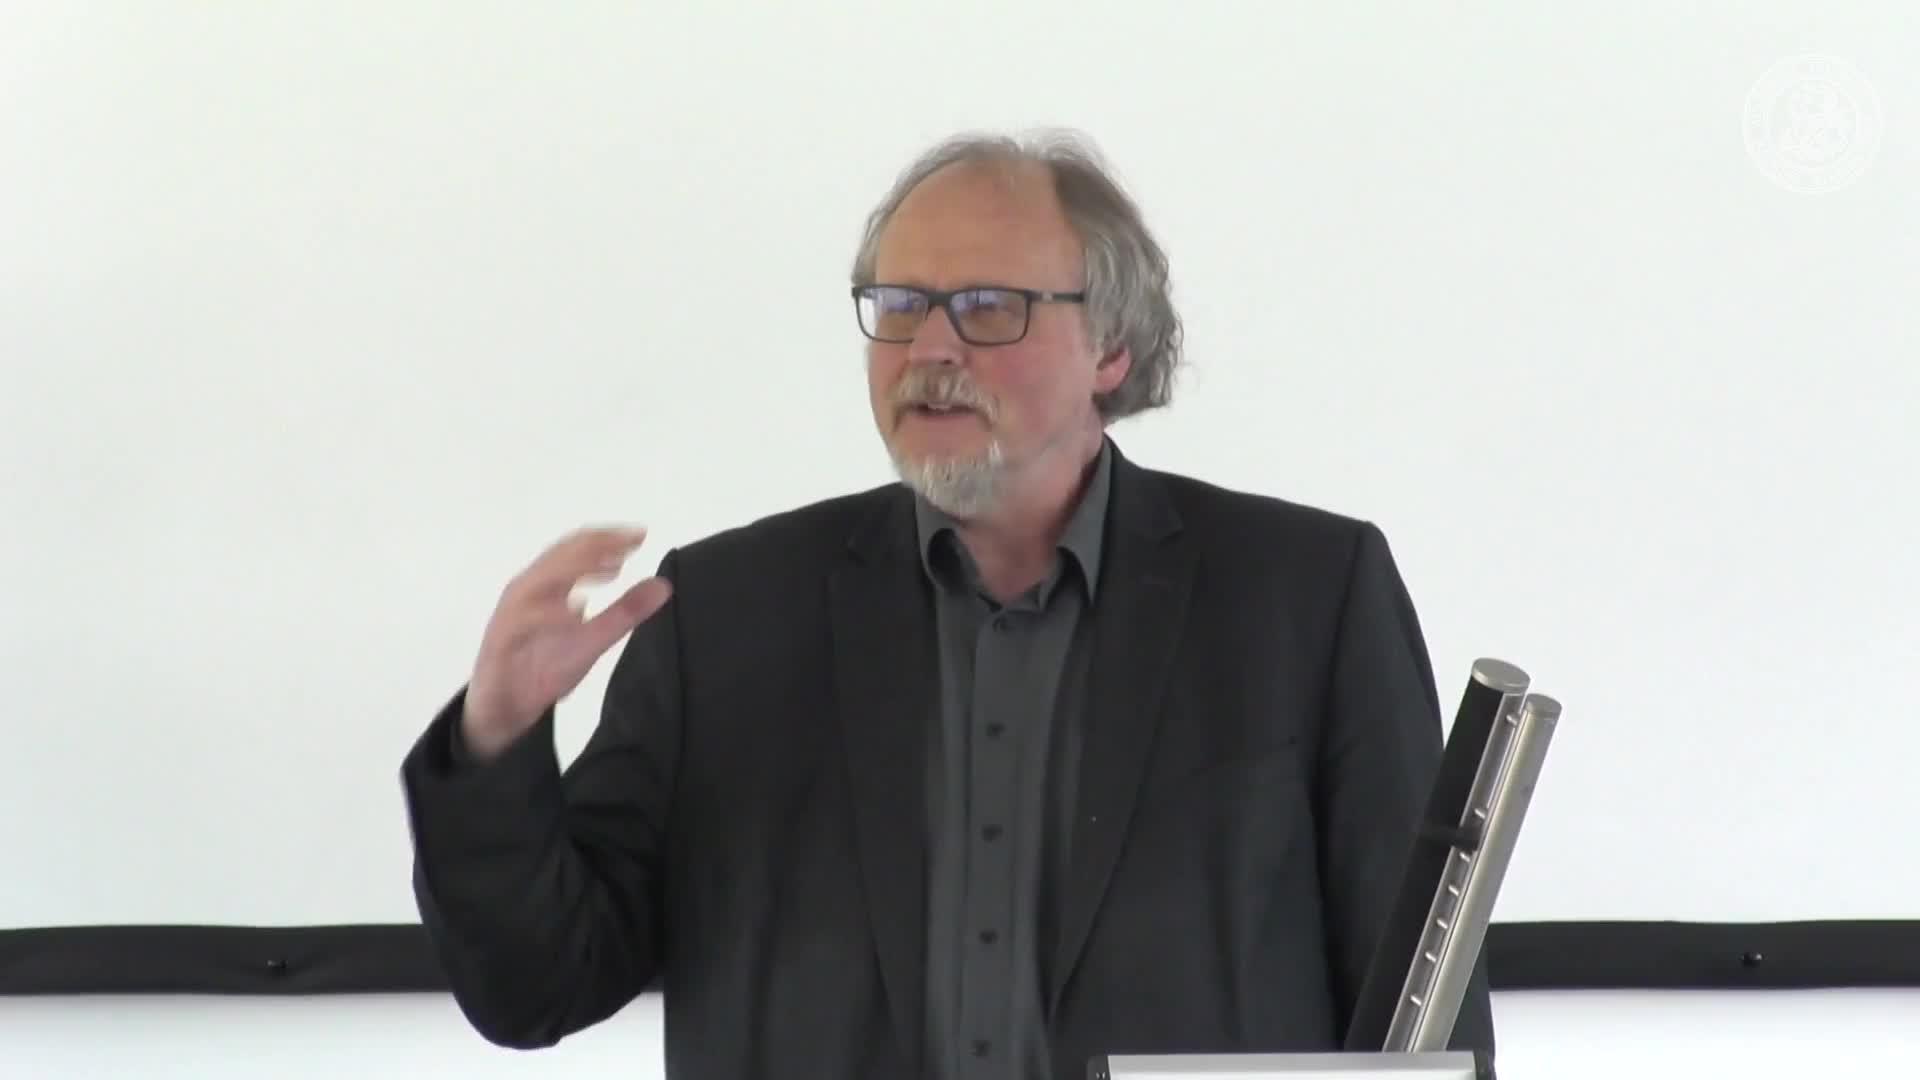 Politische Theorie II Eurozentrismus preview image